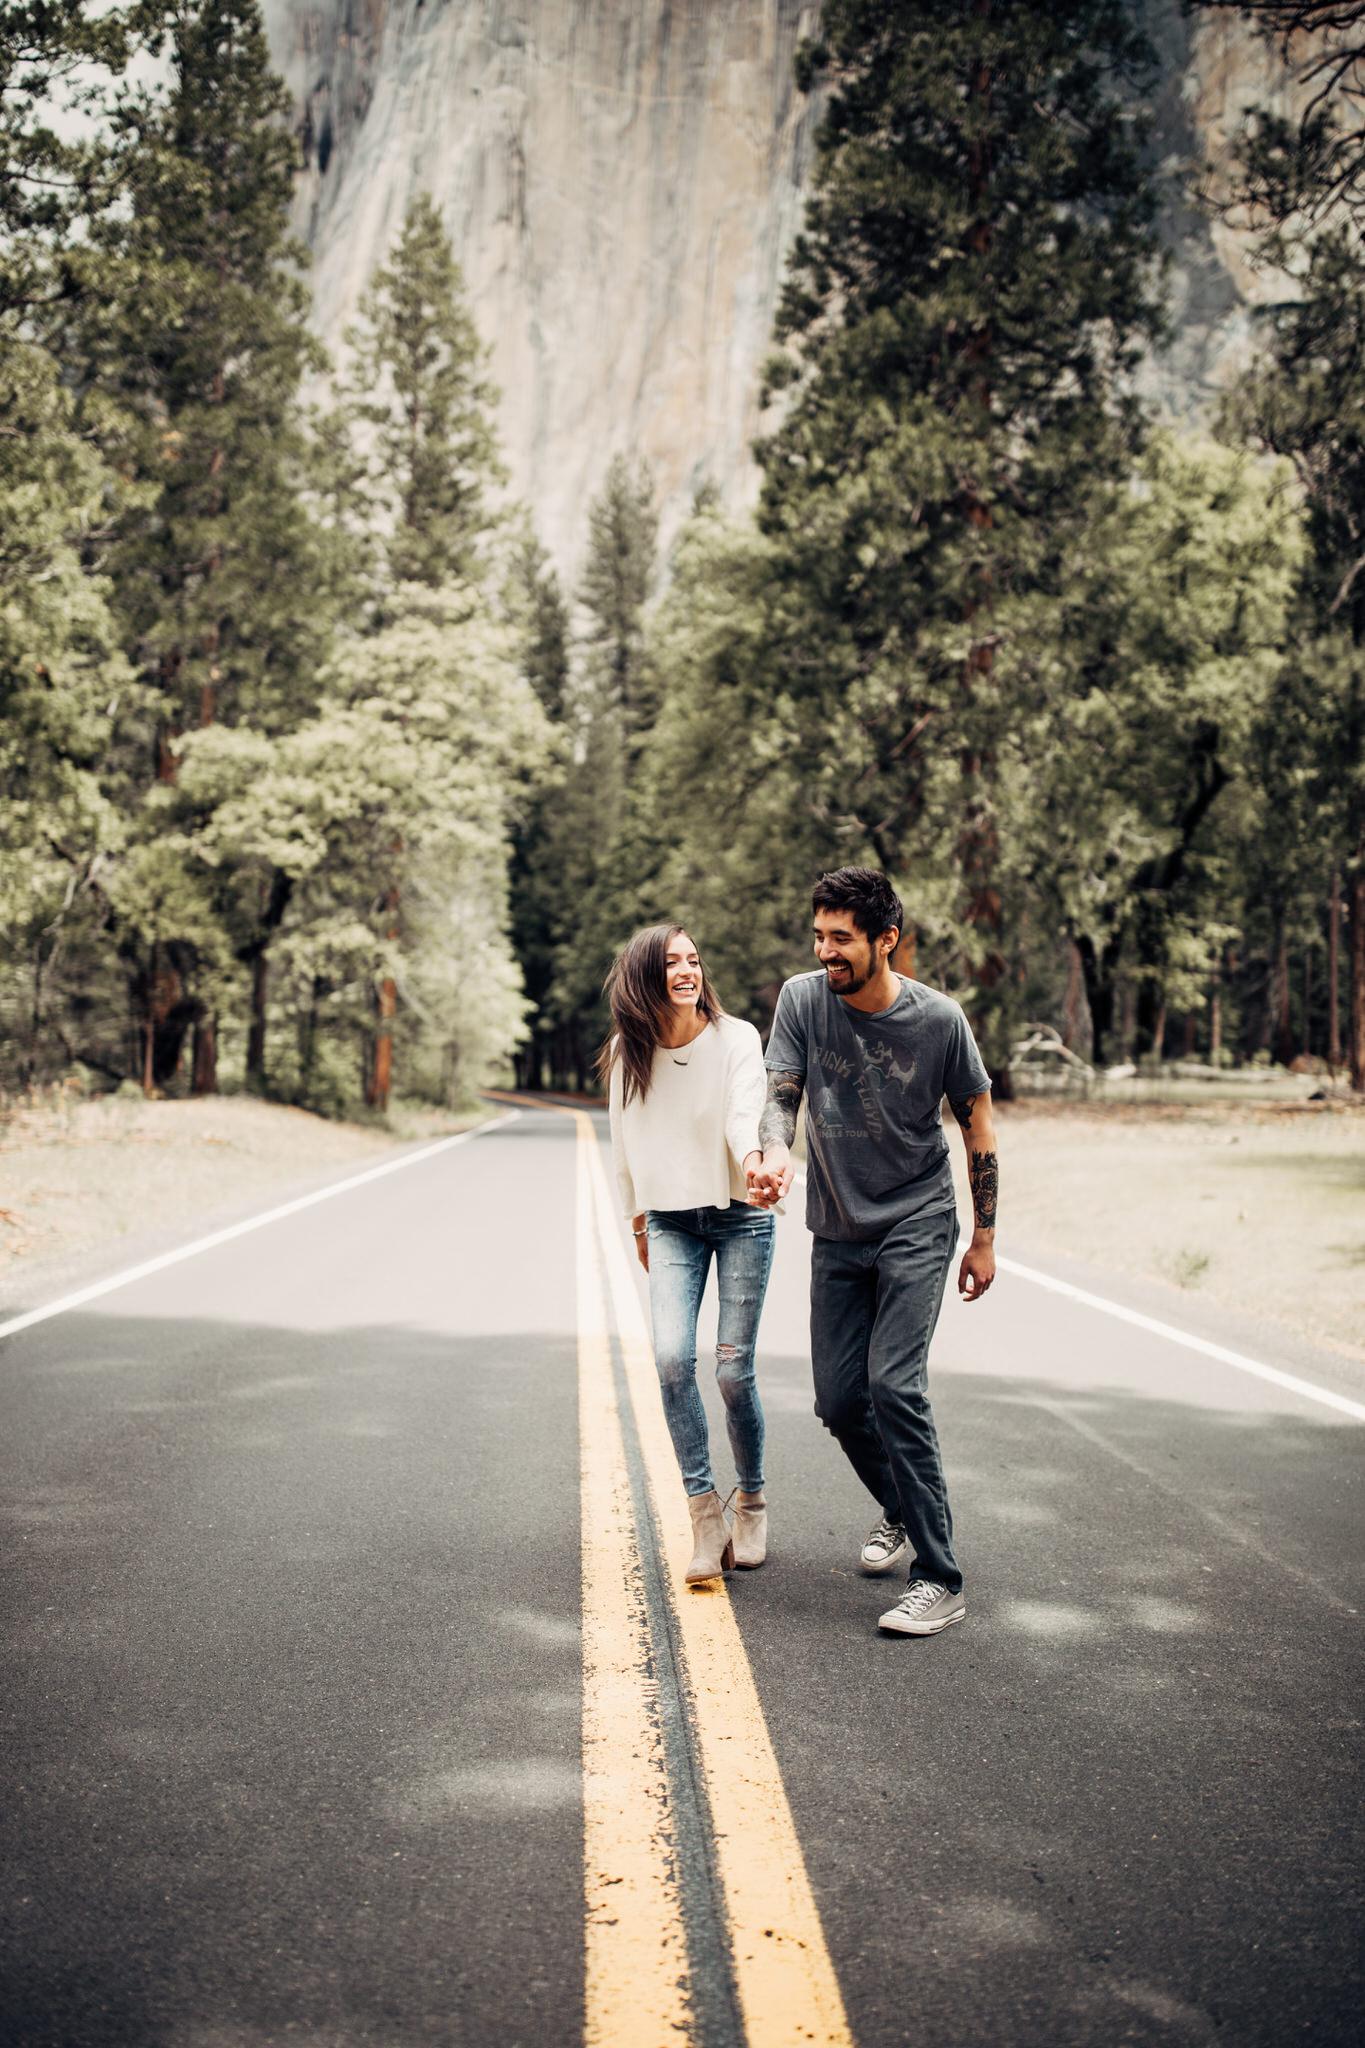 Yosemite-engagement-session-lauren-and-tom85.jpg